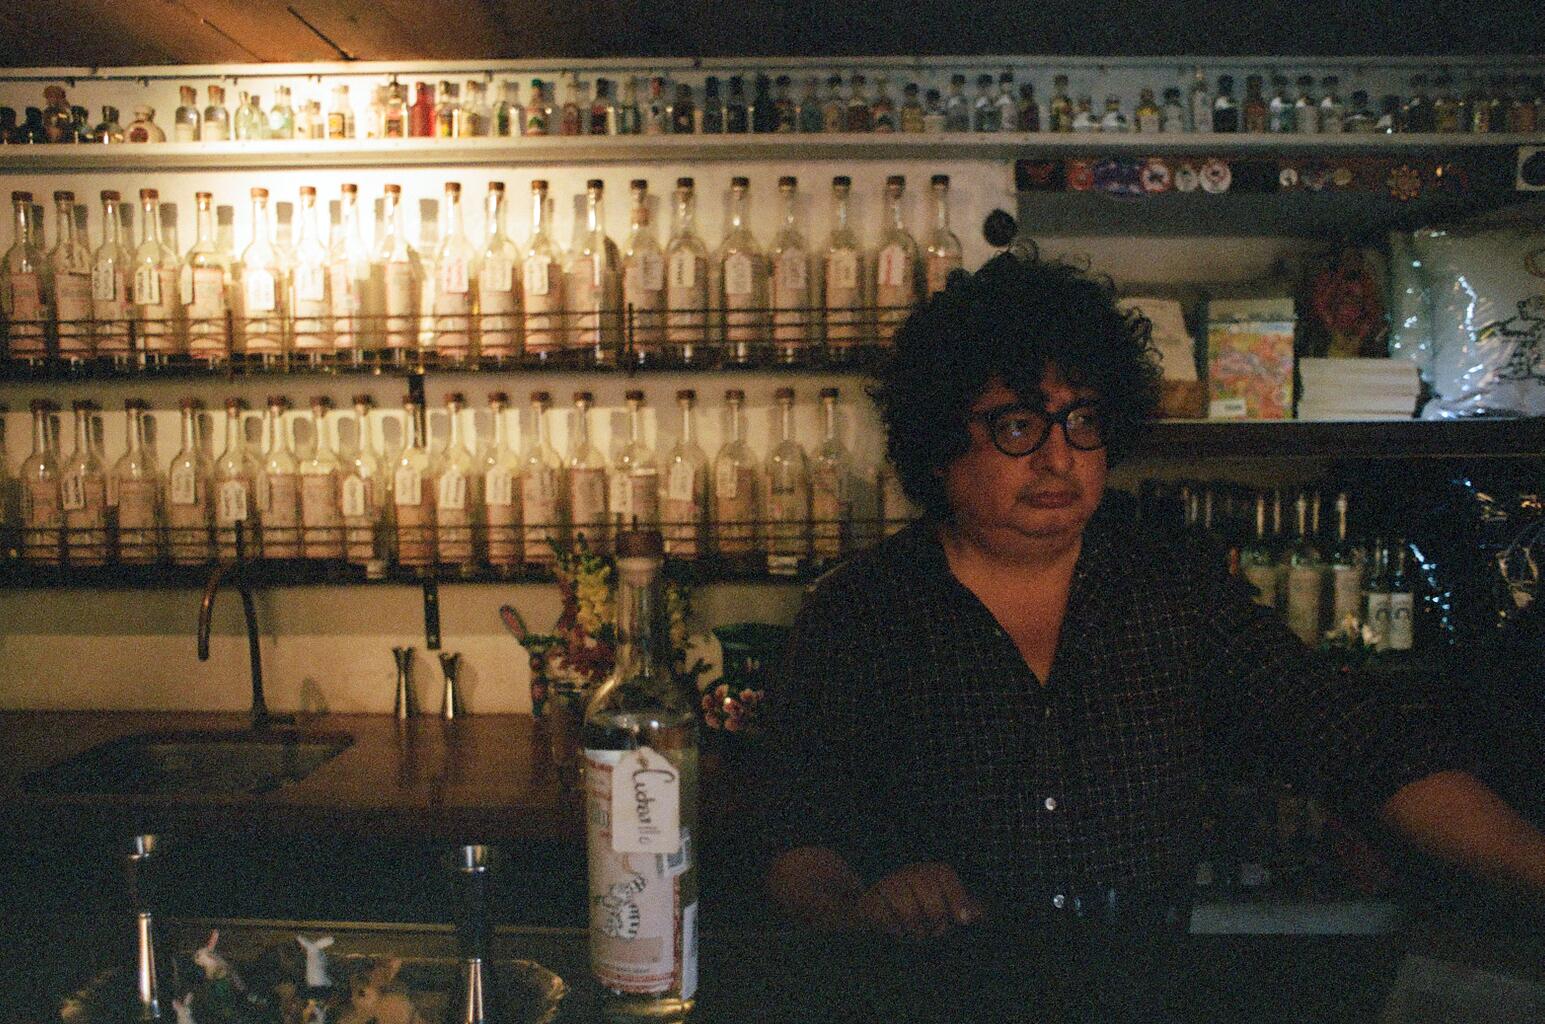 Ulises Torrentera of InSitu Mezcaleria